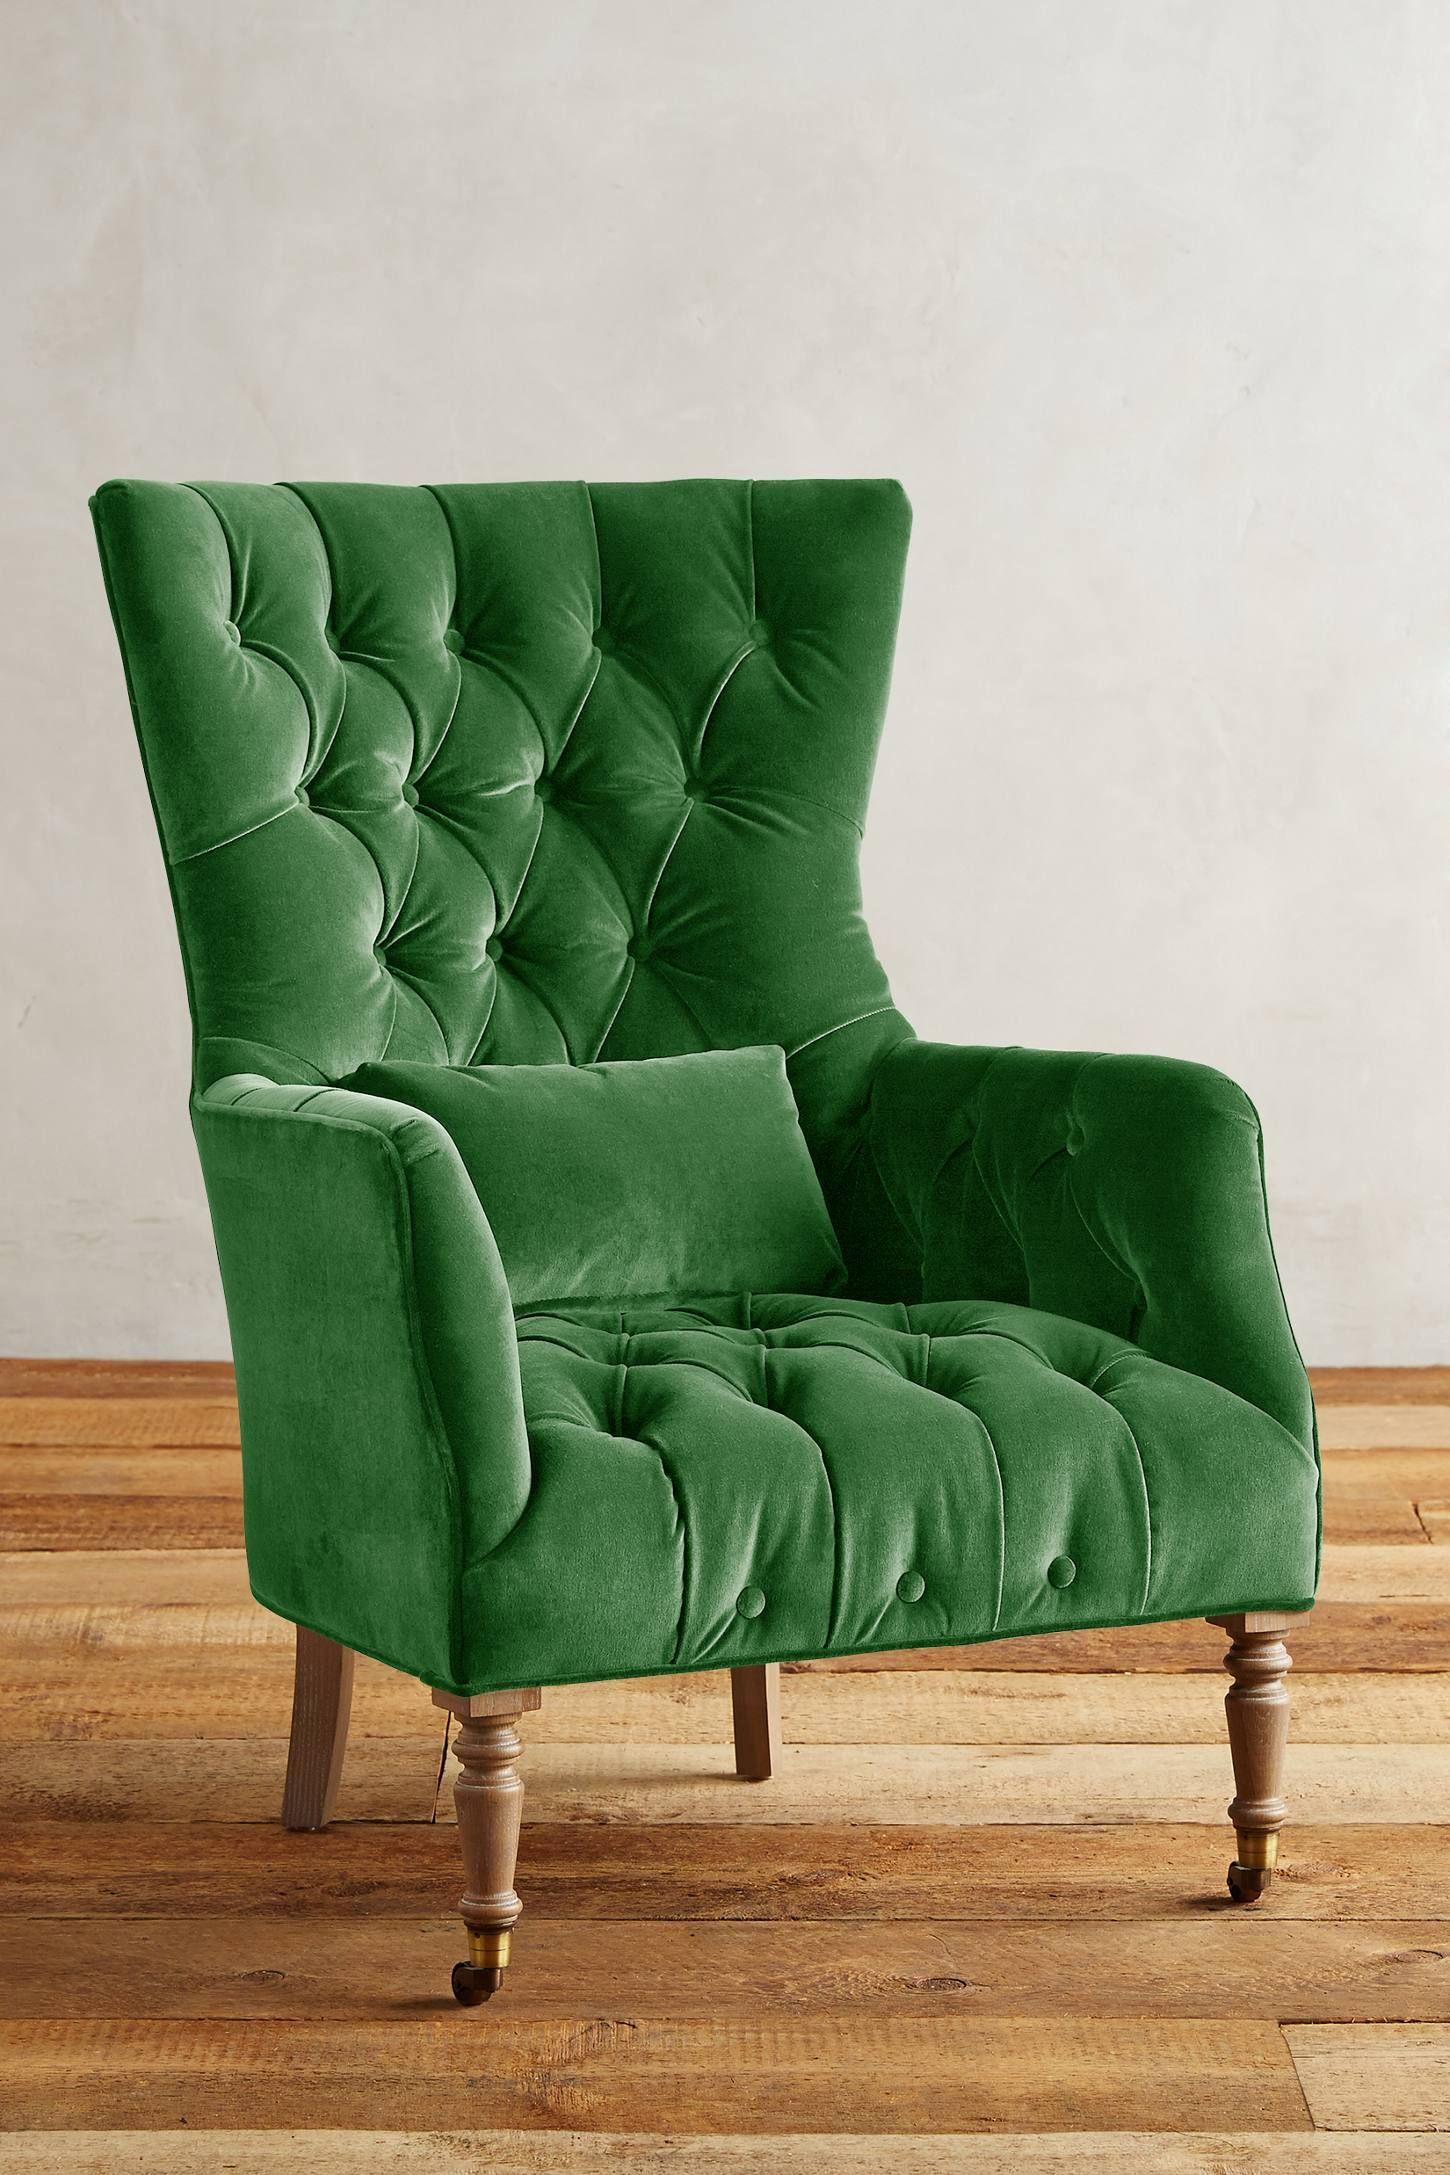 Velvet Julienne Chair Furniture, Anthropologie chair